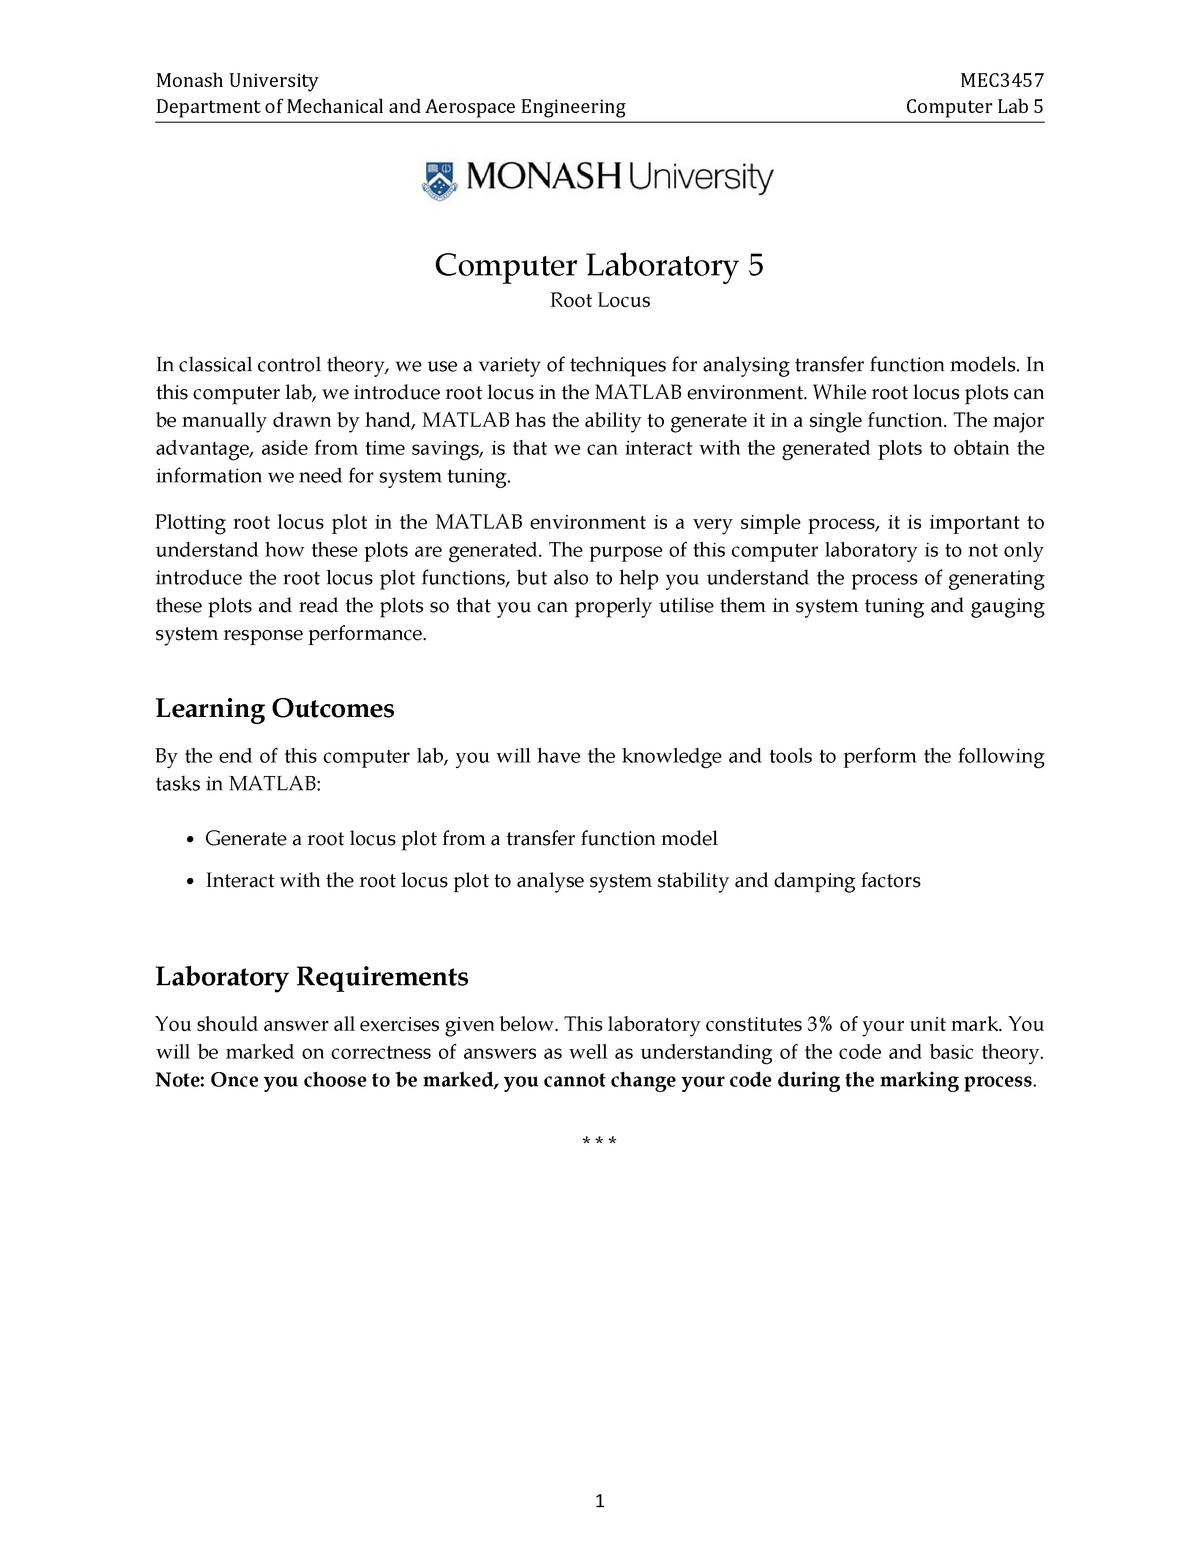 MEC3457 Computer Lab 5 - MEC3457: Systems And Control - StuDocu